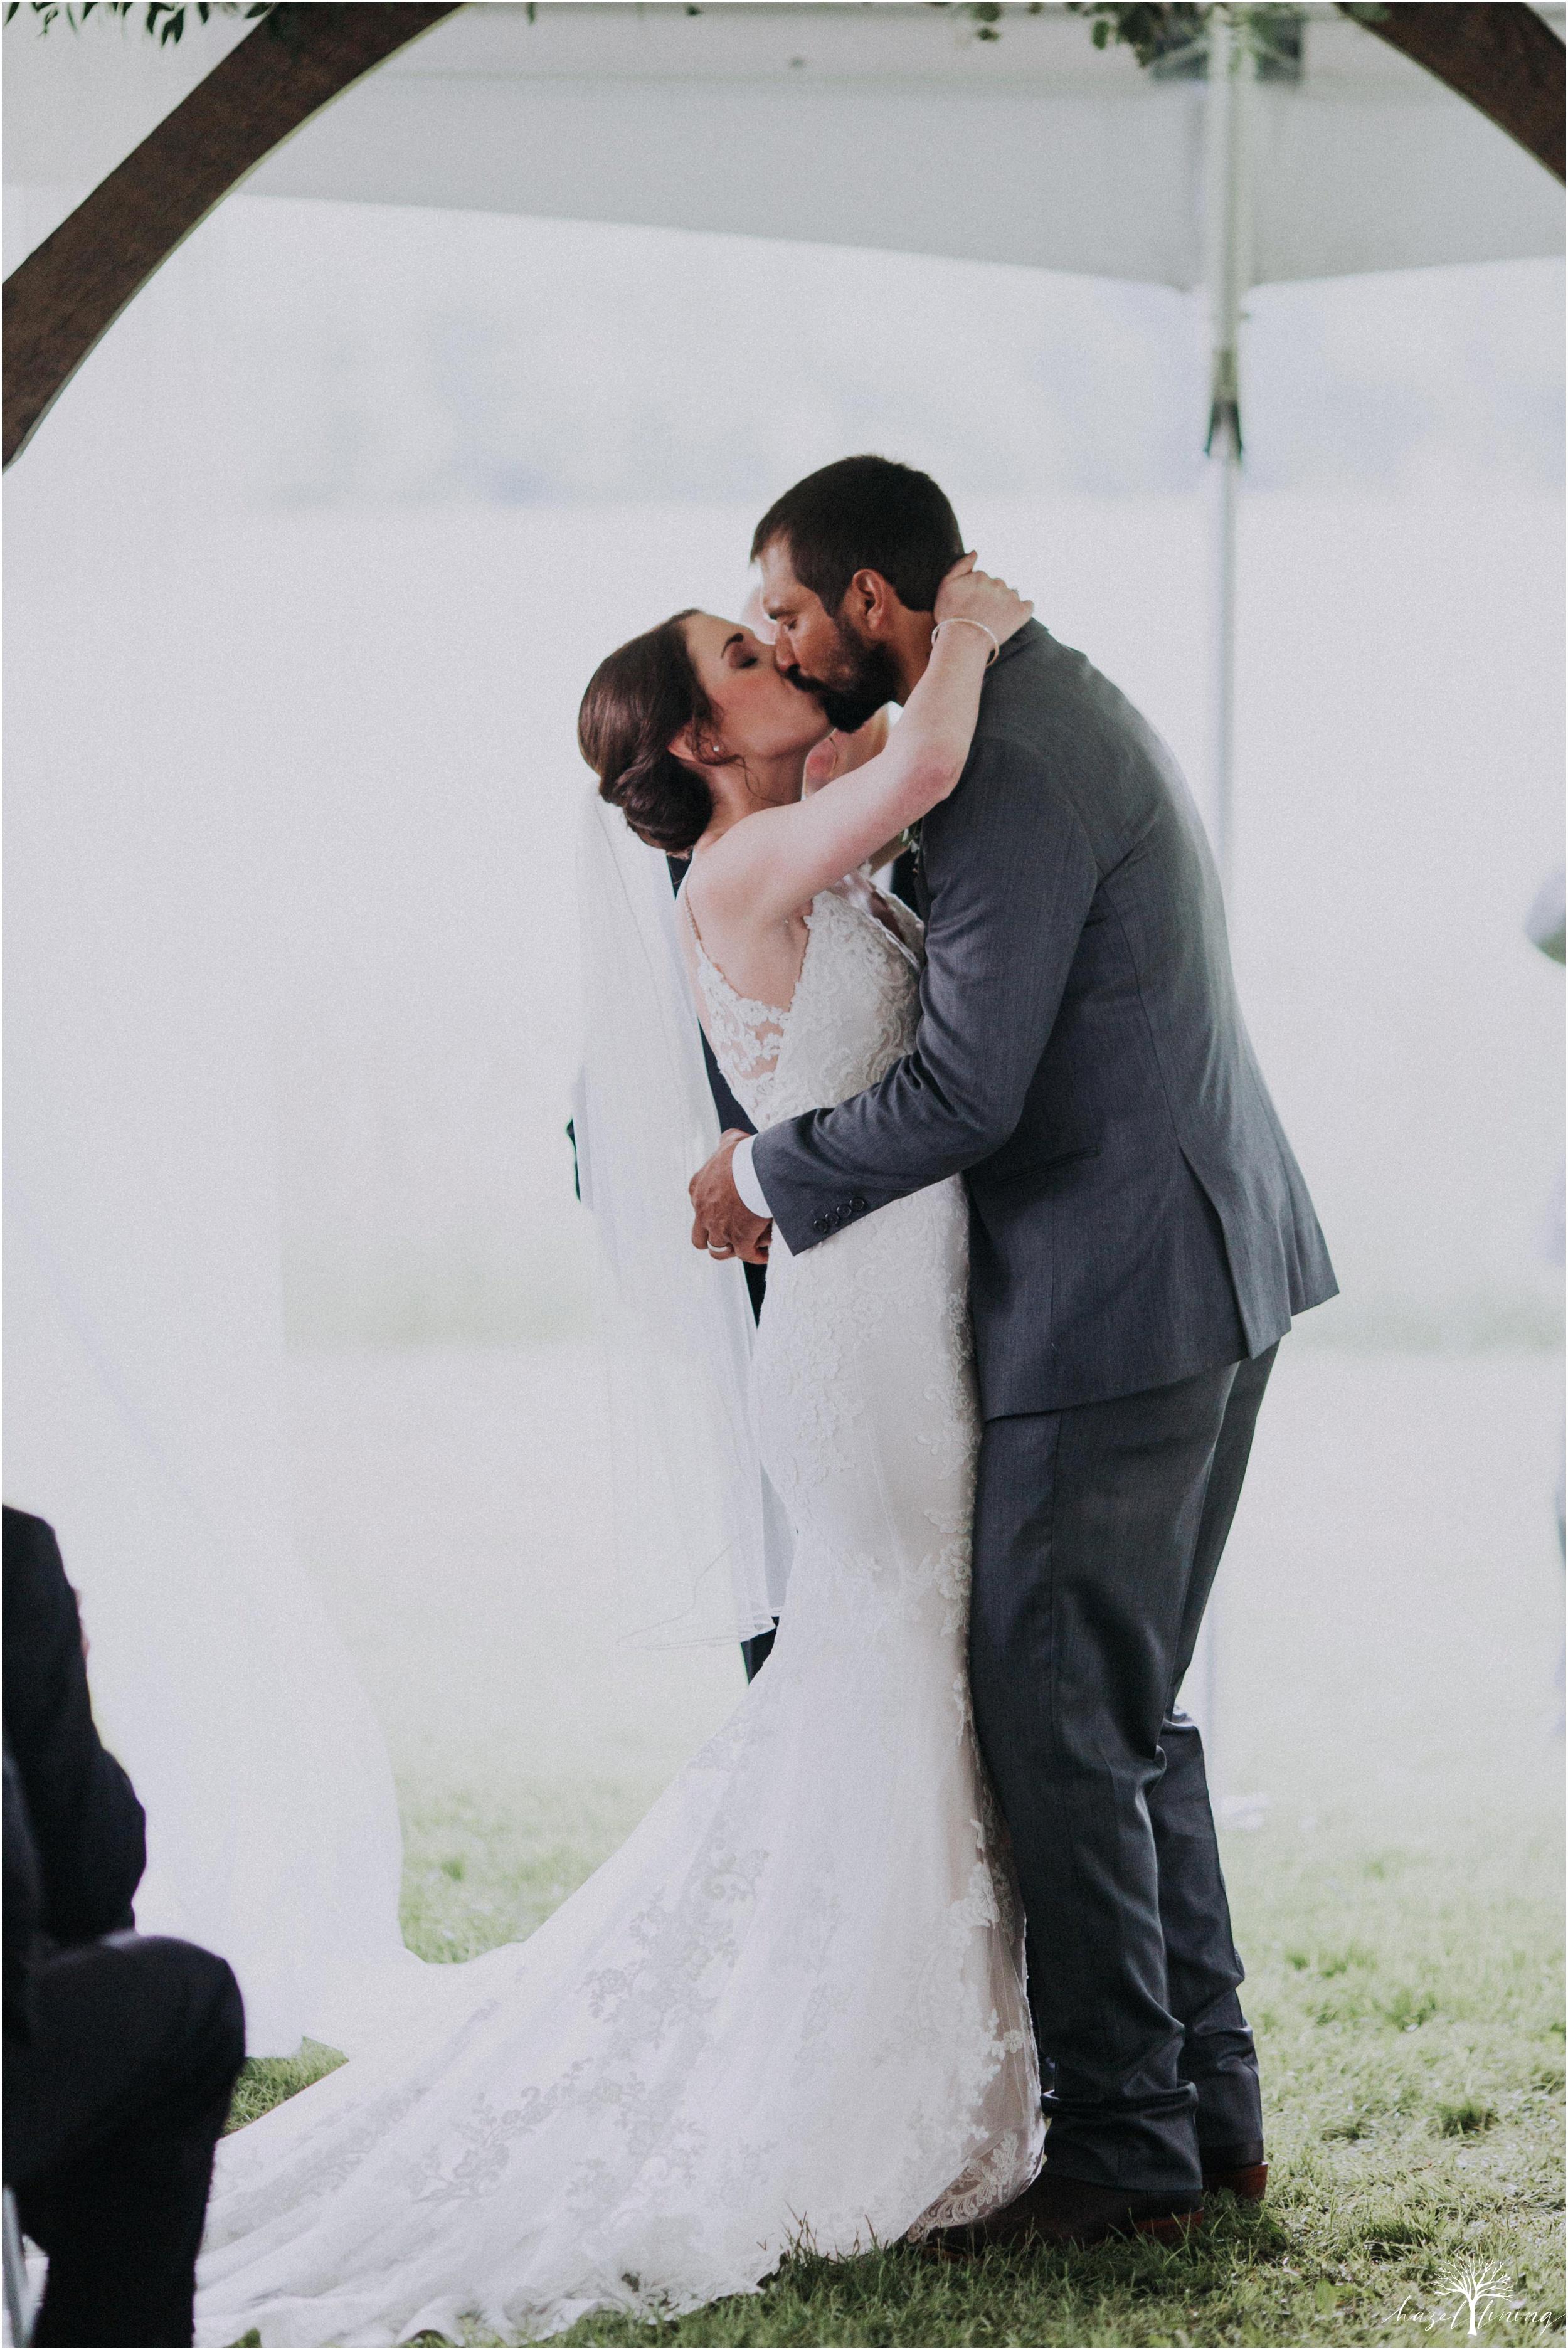 hazel-lining-travel-wedding-elopement-photography-lisa-landon-shoemaker-the-farm-bakery-and-events-bucks-county-quakertown-pennsylvania-summer-country-outdoor-farm-wedding_0064.jpg